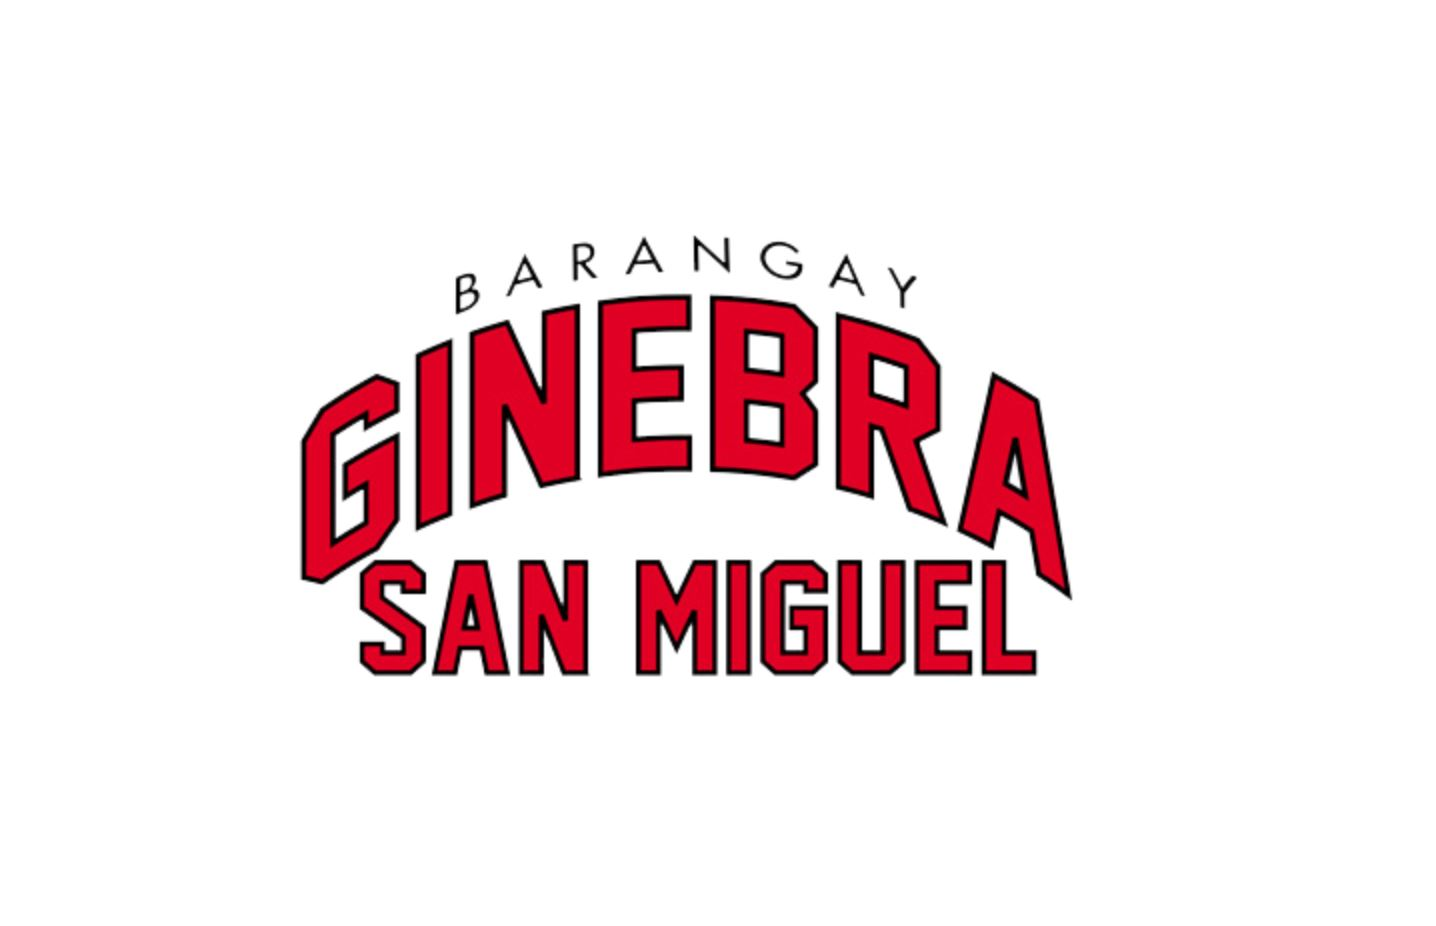 Barangay Ginebra San Miguel - Barangay Ginebra San Miguel